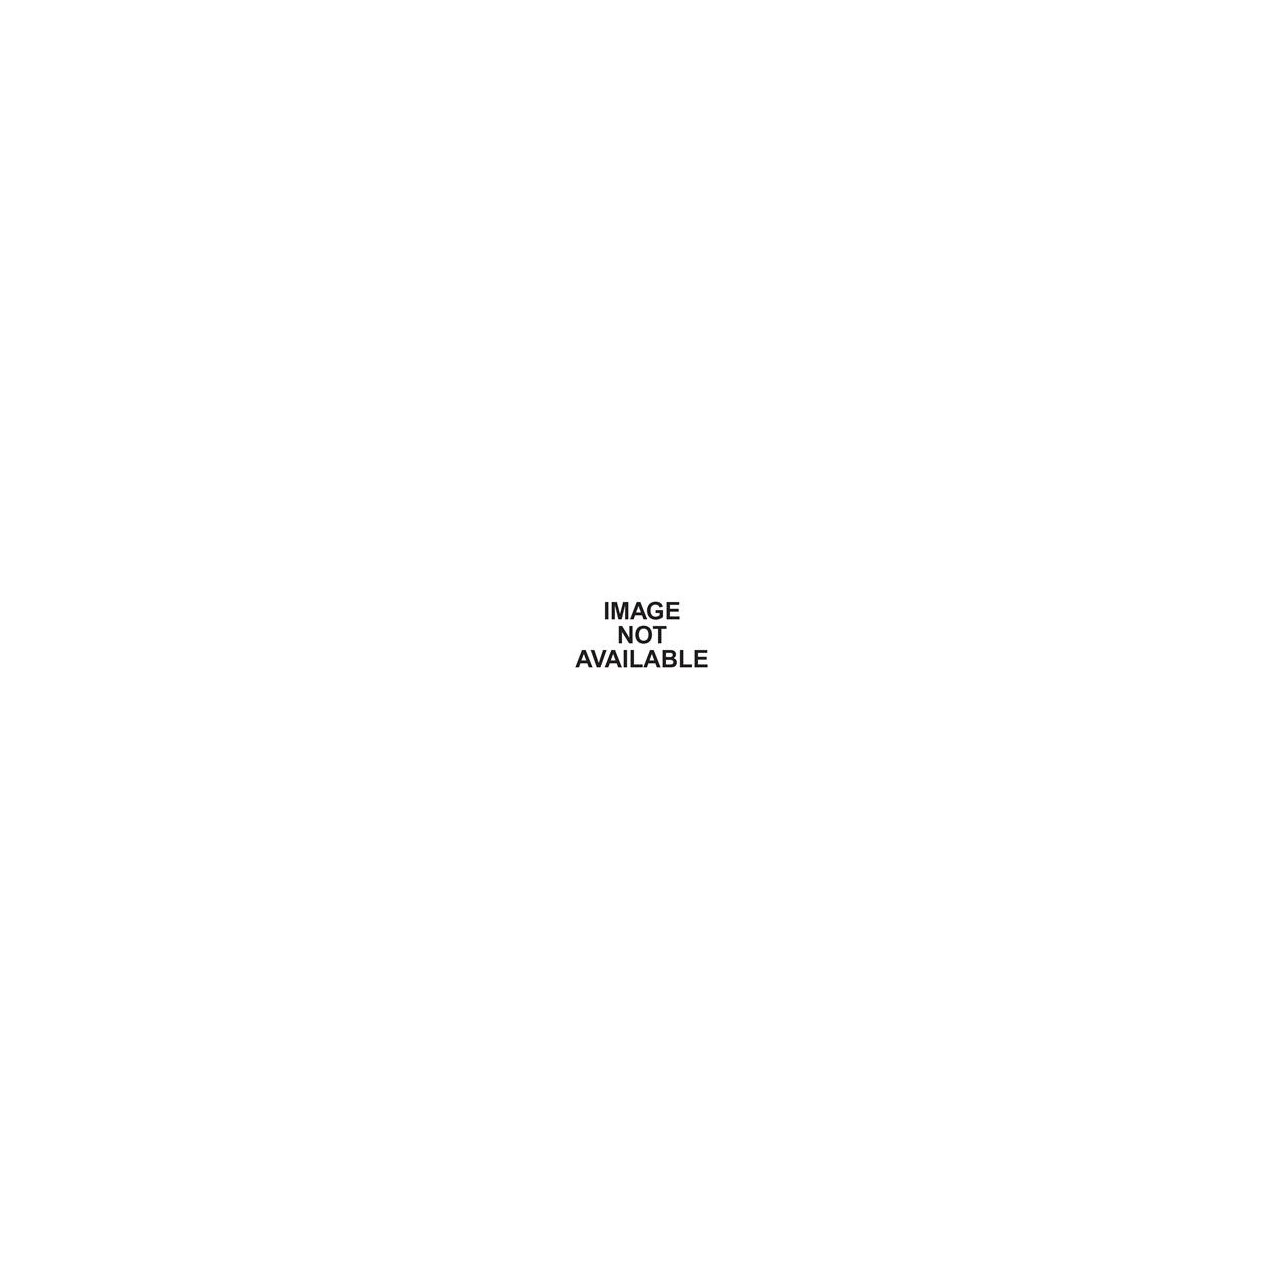 The Hillman Group 830674 1//2SS SPLIT LOCK WASHER